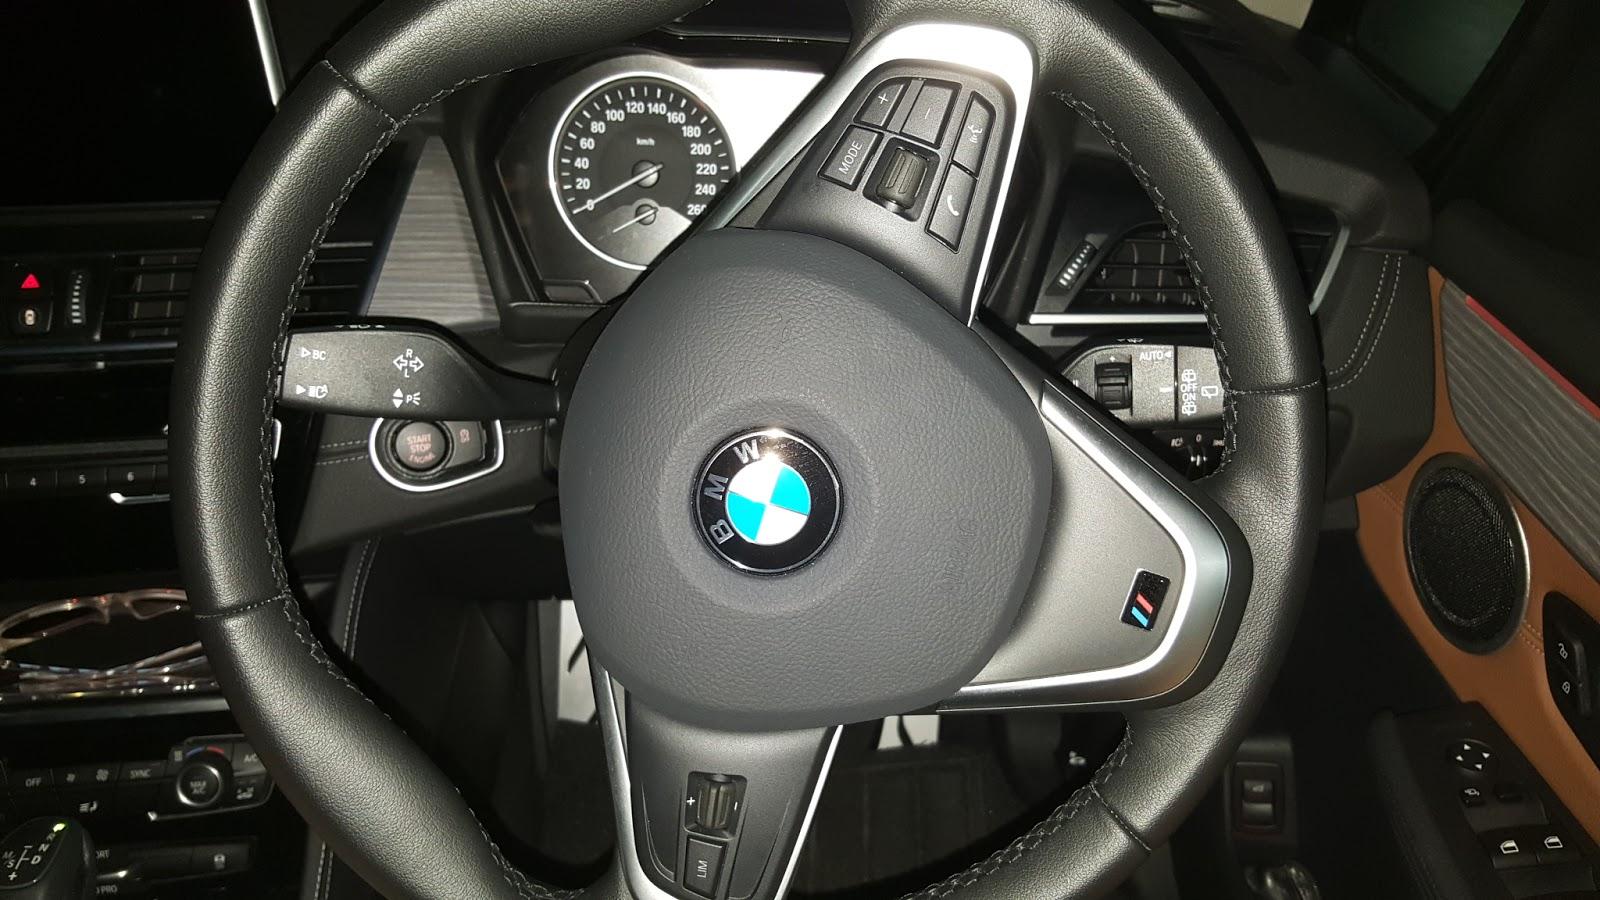 BMW Coding for F45, F46, F48 (Active Tourer / Gran Tourer / X1): DIY